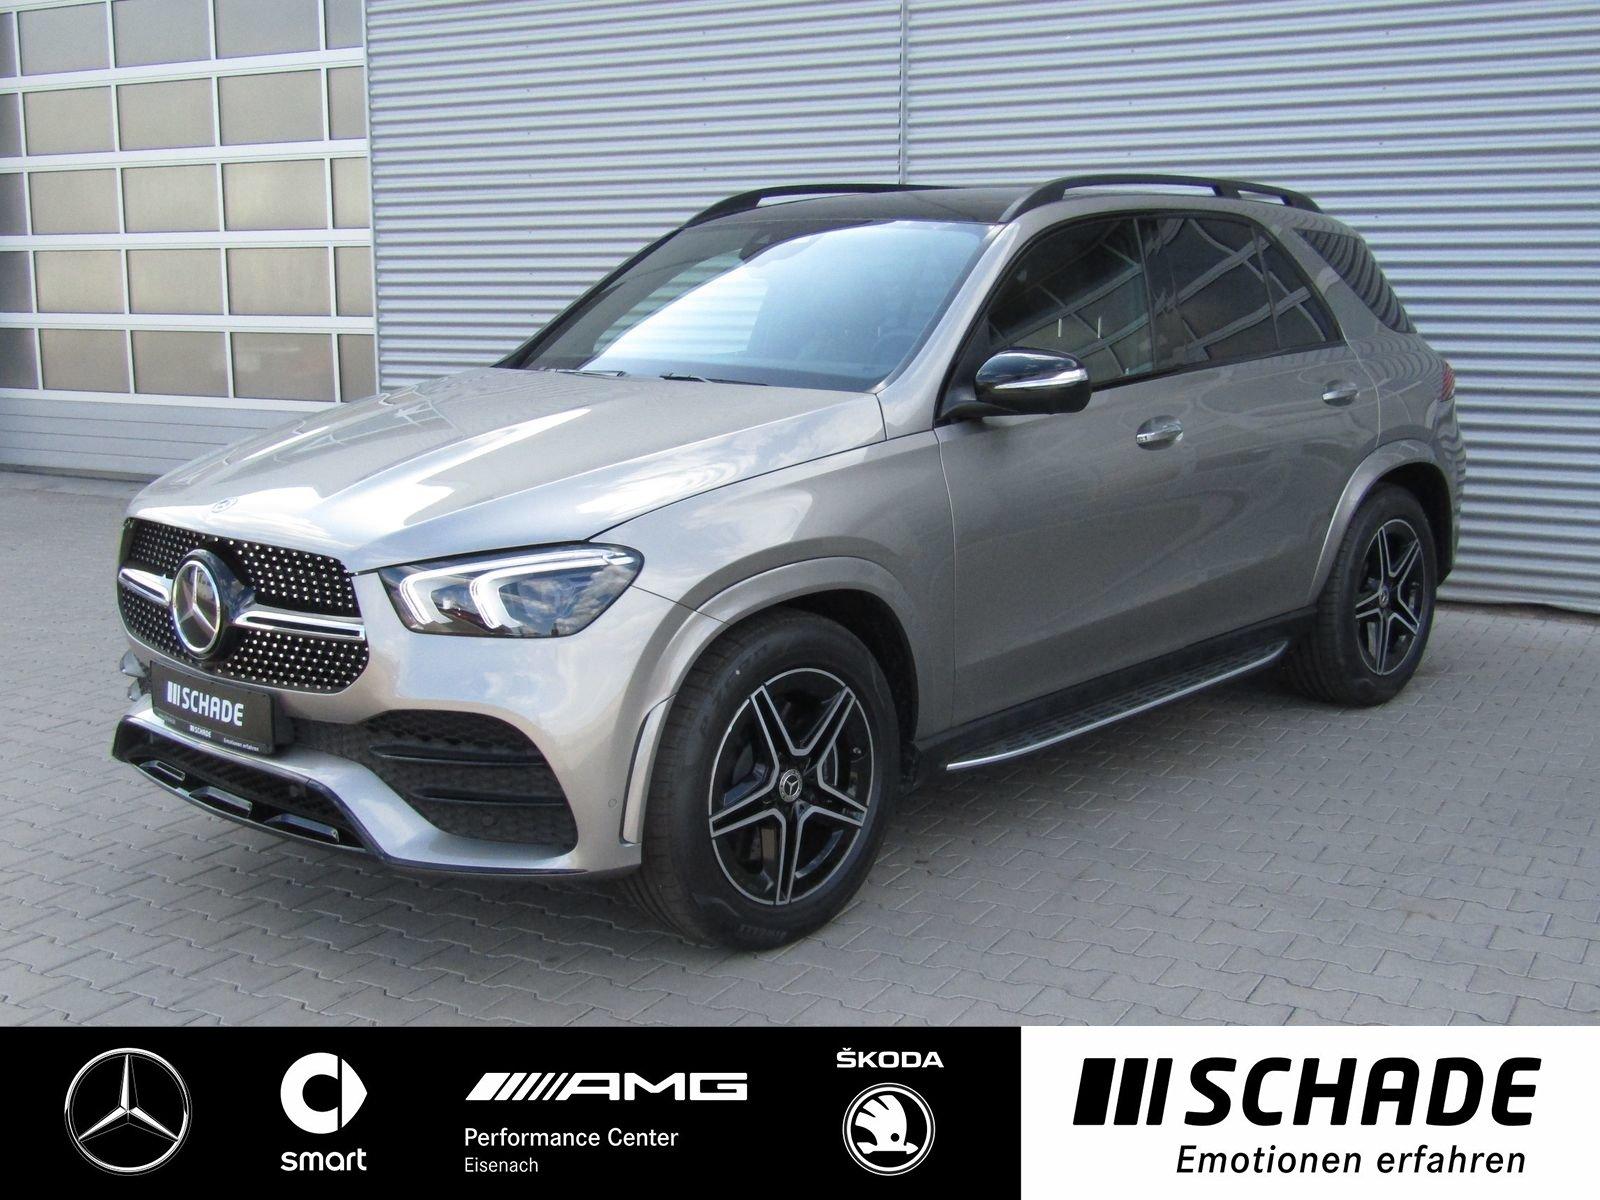 Mercedes-Benz GLE 300 d 4M AMG Burmester*AHK*360°*Widescreen*, Jahr 2019, Diesel